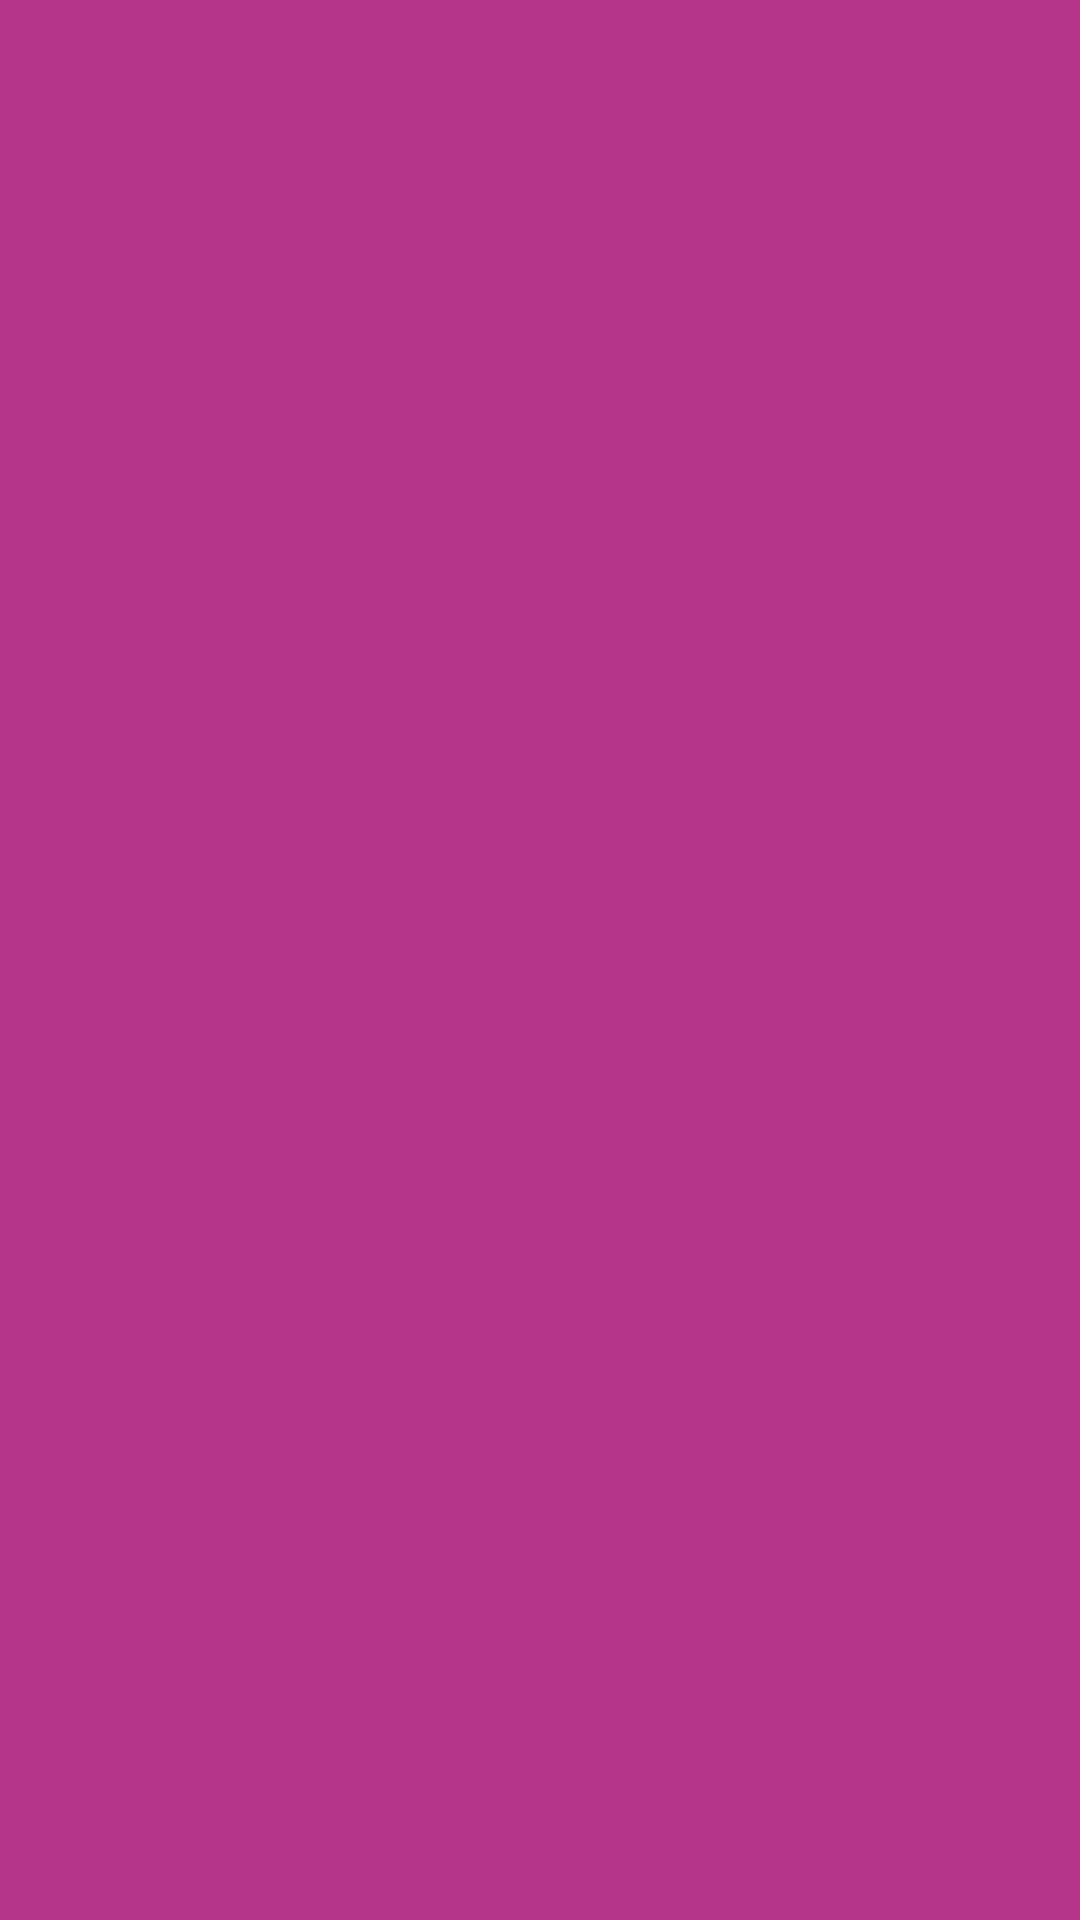 1080x1920 Fandango Solid Color Background